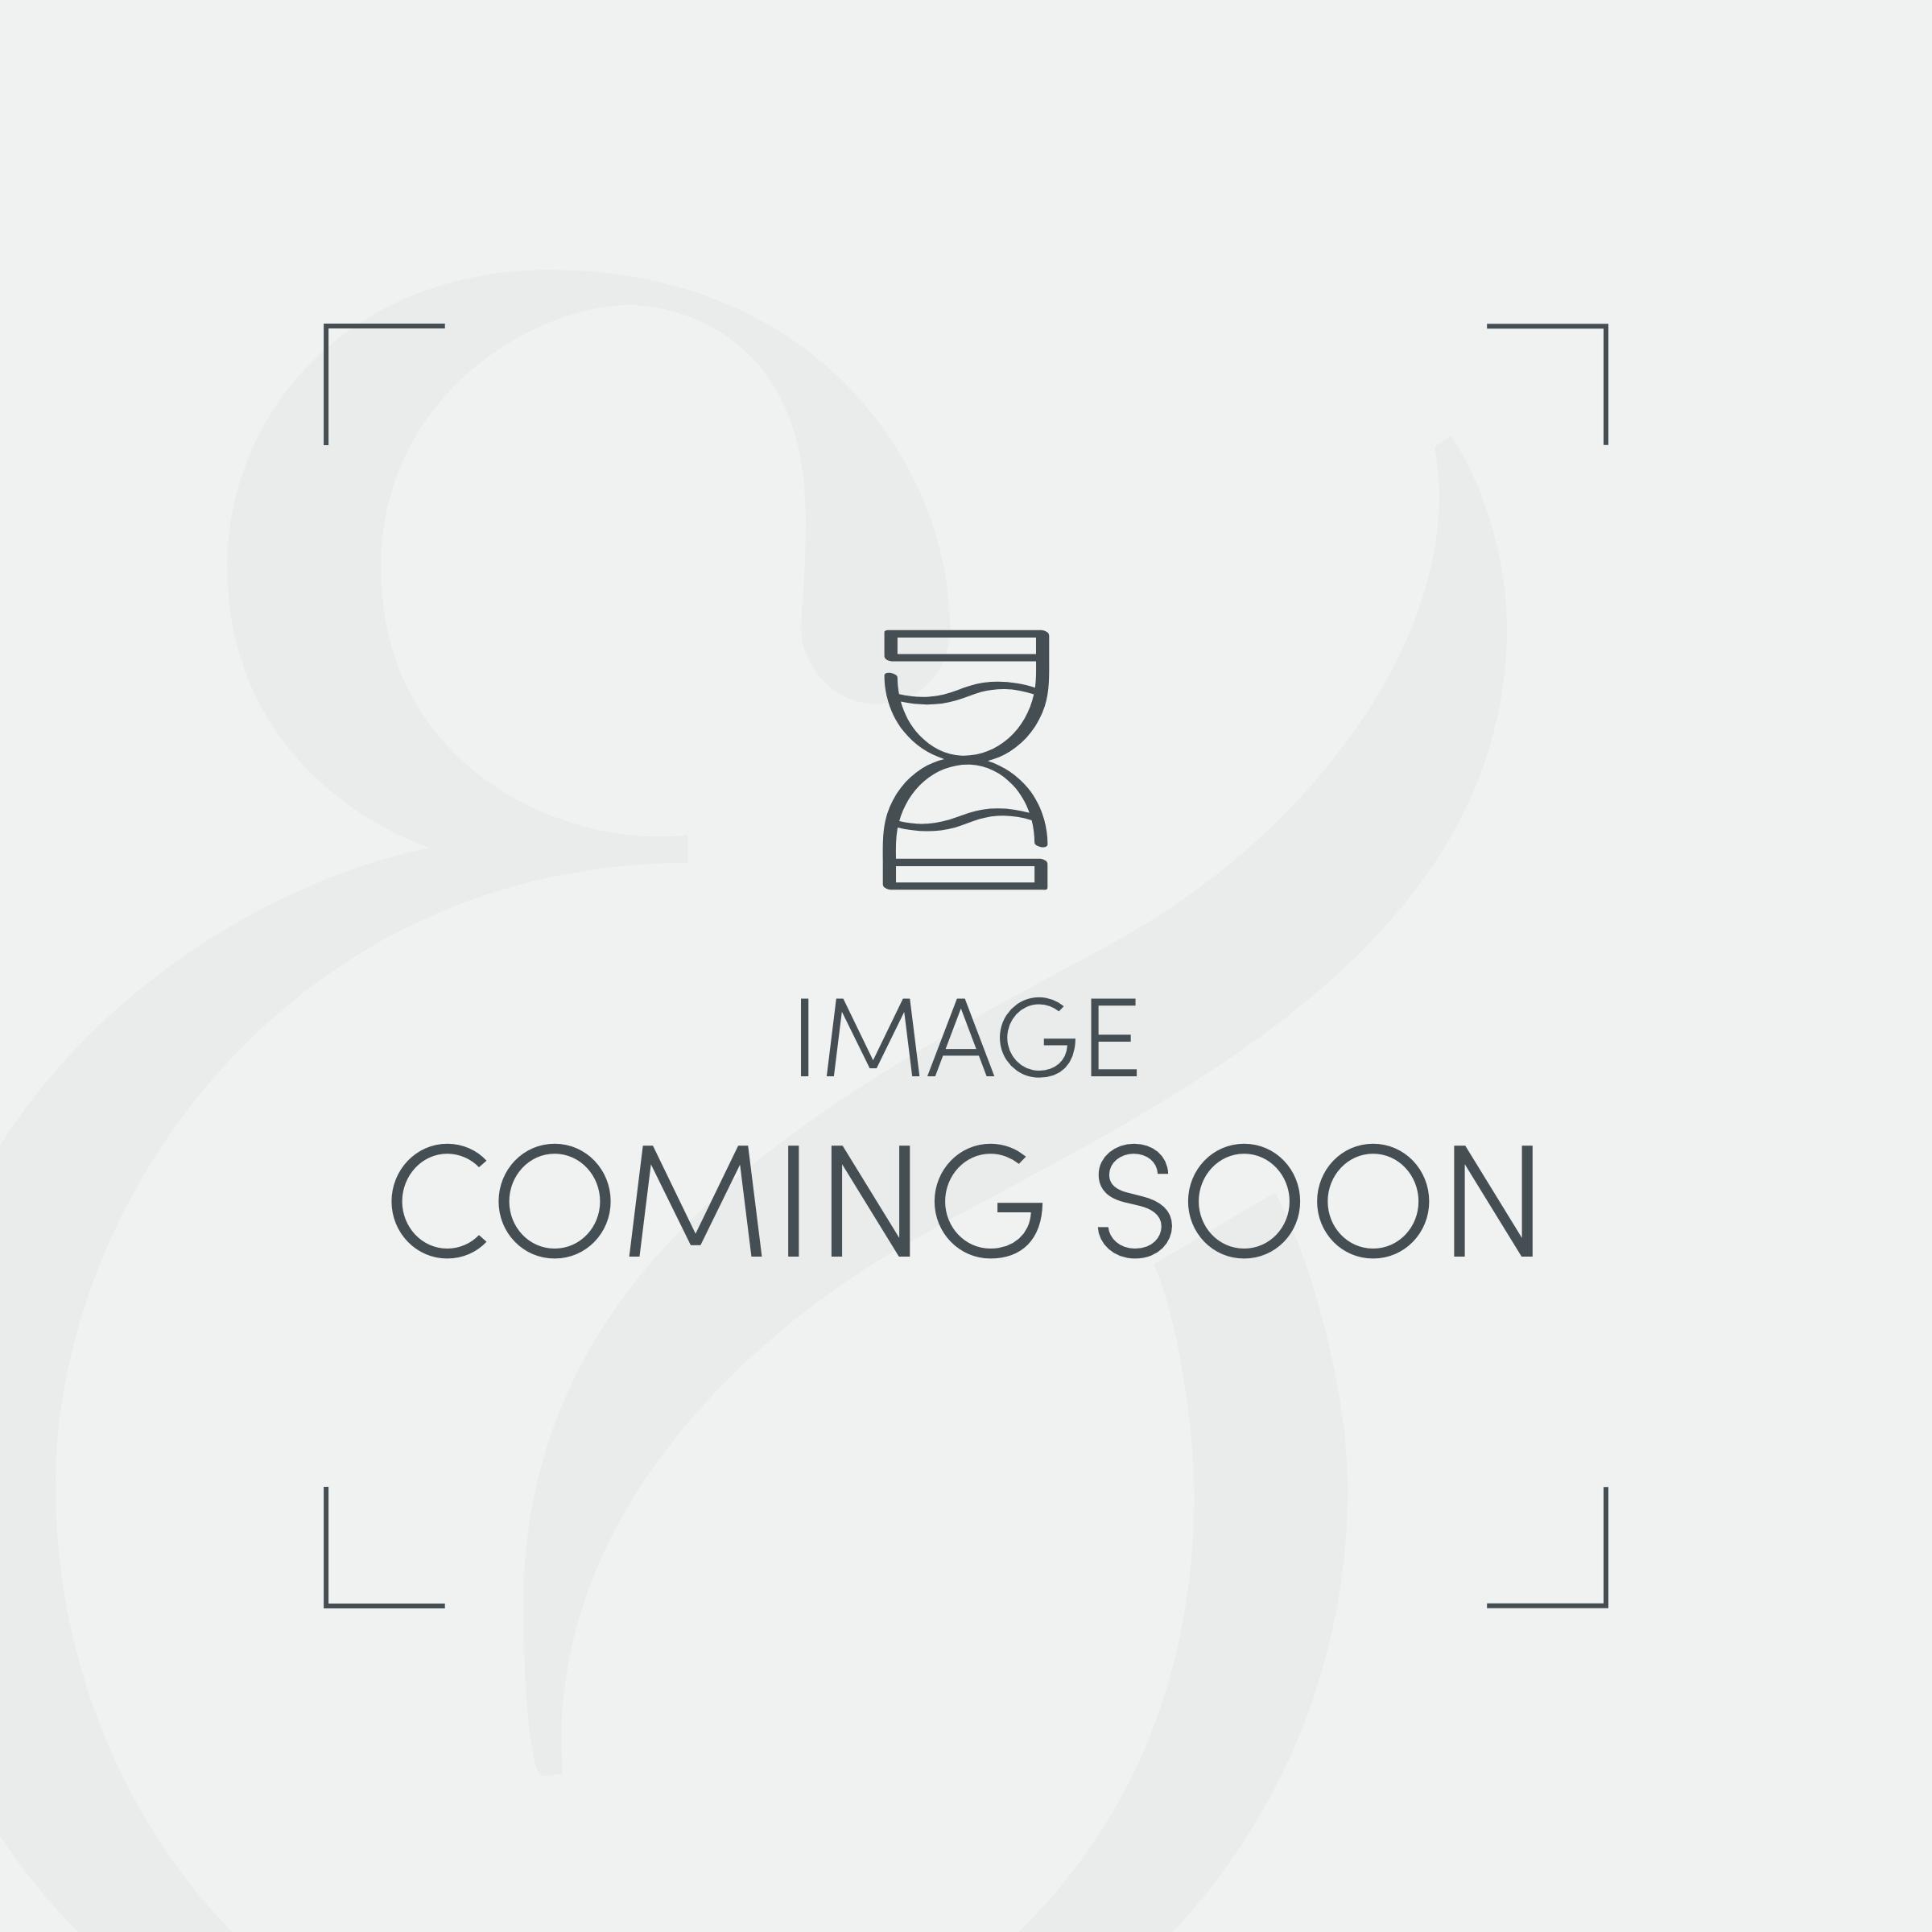 Ultimate Supima Cotton Towel Set (2 x Hand Towels, 2 x Bath Towels) - Stone